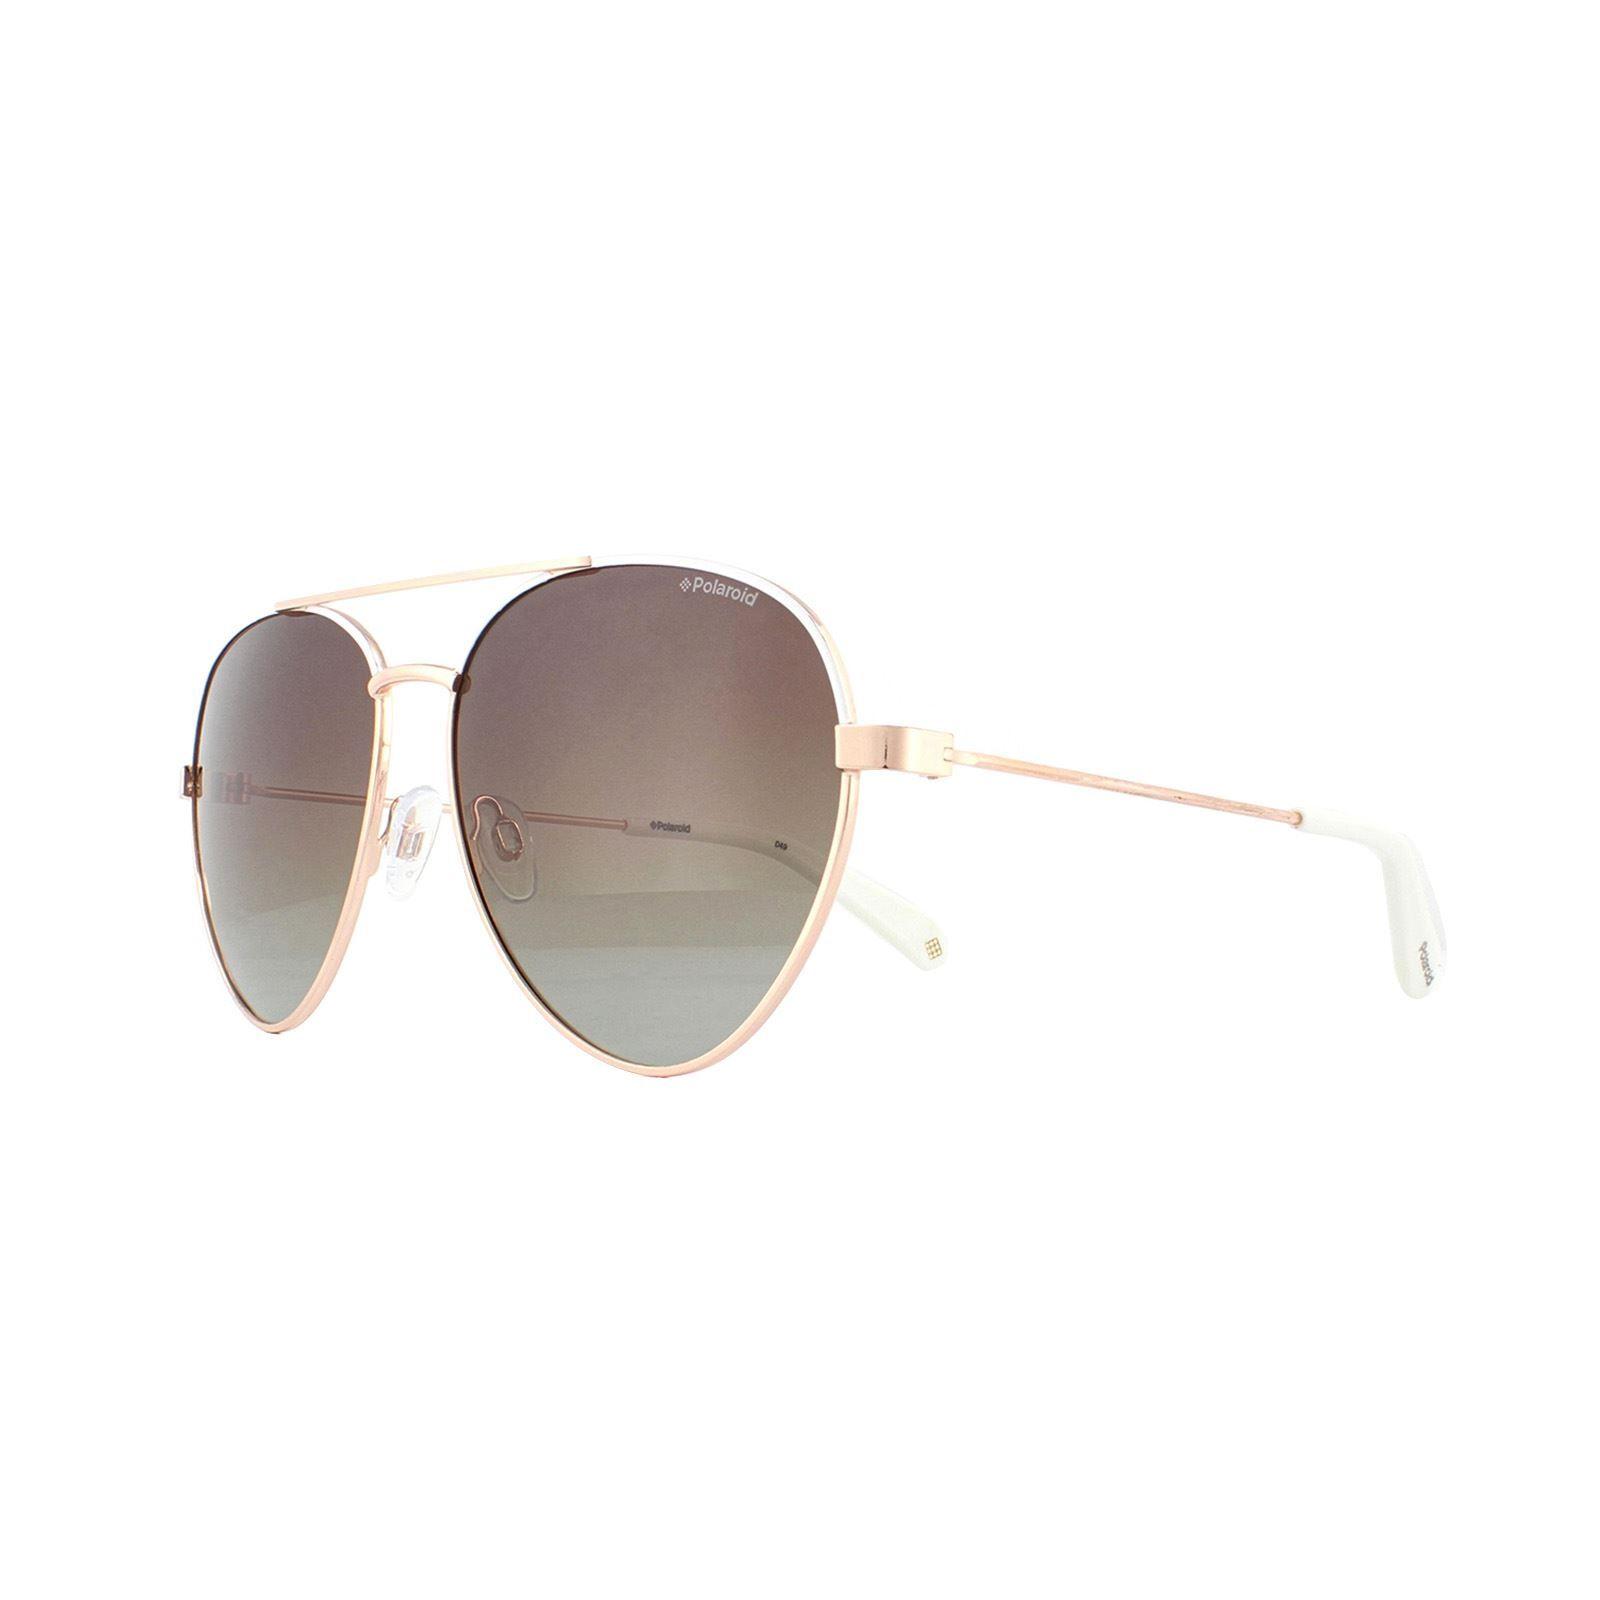 Polaroid Sunglasses PLD 6055/S VK6 LA White Brown Gradient Polarized